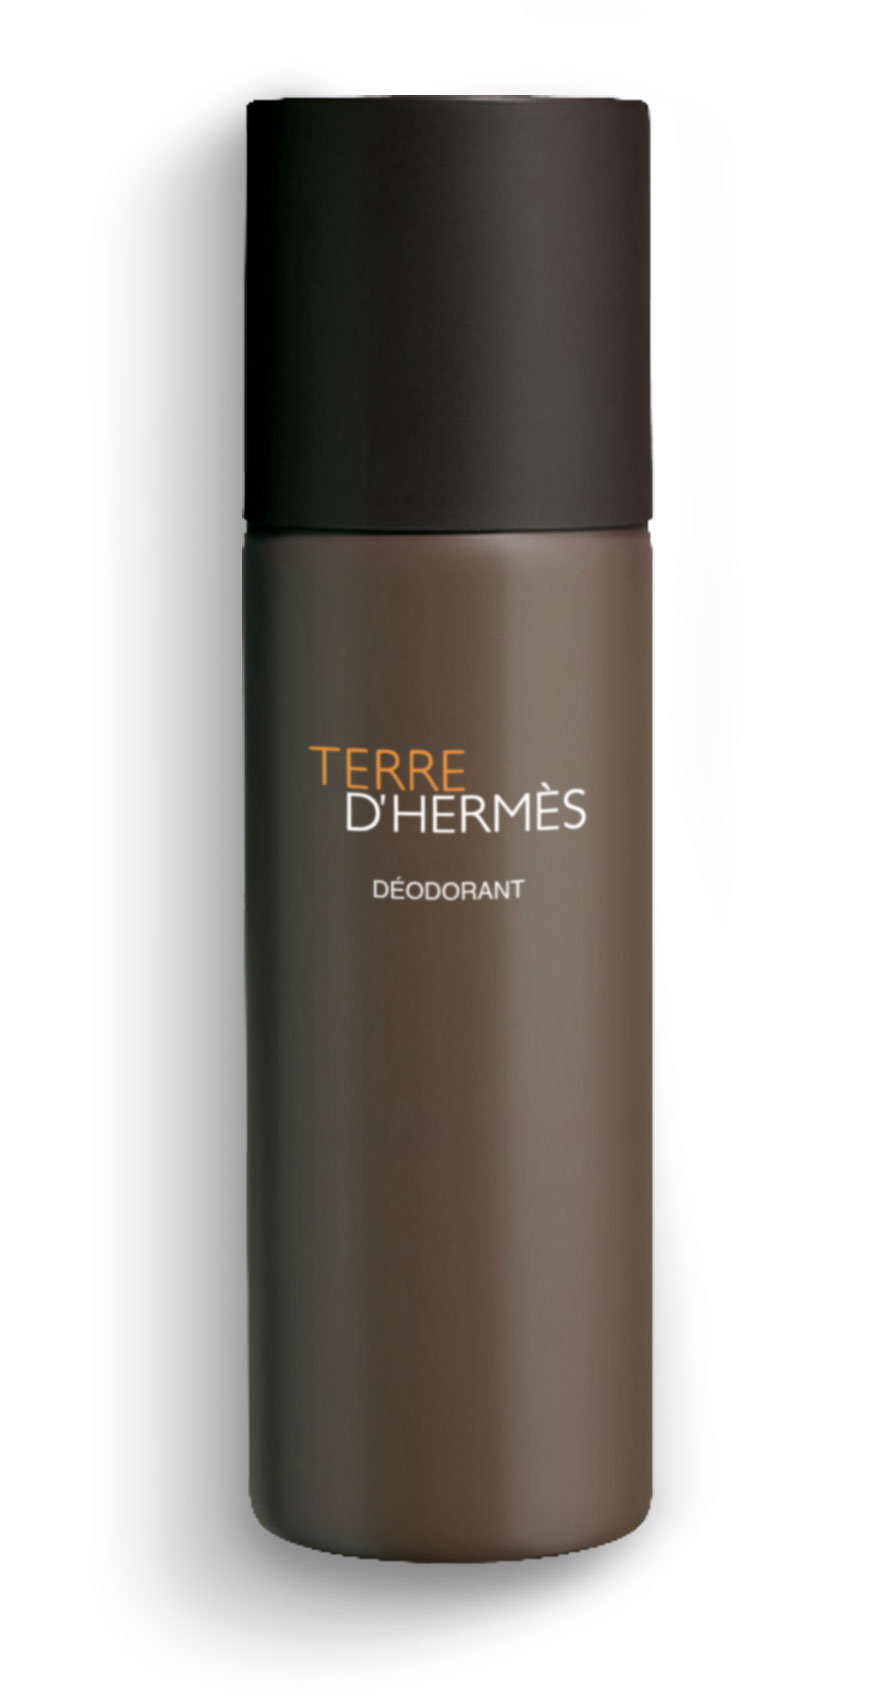 Hermès - Terre d'Hermès - Déodorant spray 150 ml.